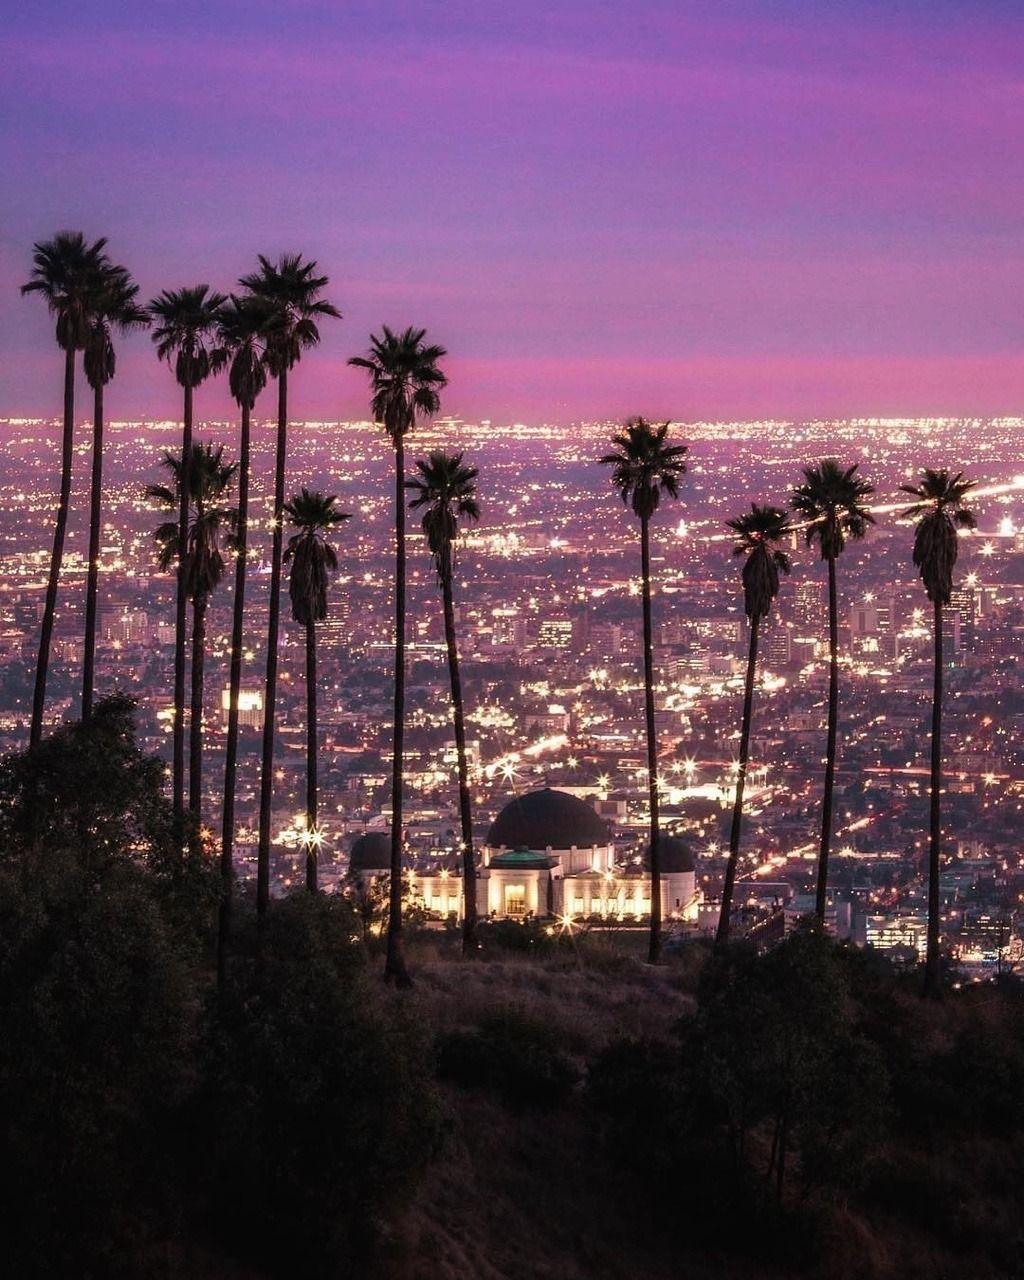 Los Angeles At Night By Lommylundberg By Californiafeelings Com California Cali La Ca Sf Sandiego Los Angeles At Night Los Angeles Wallpaper Los Angeles Parks